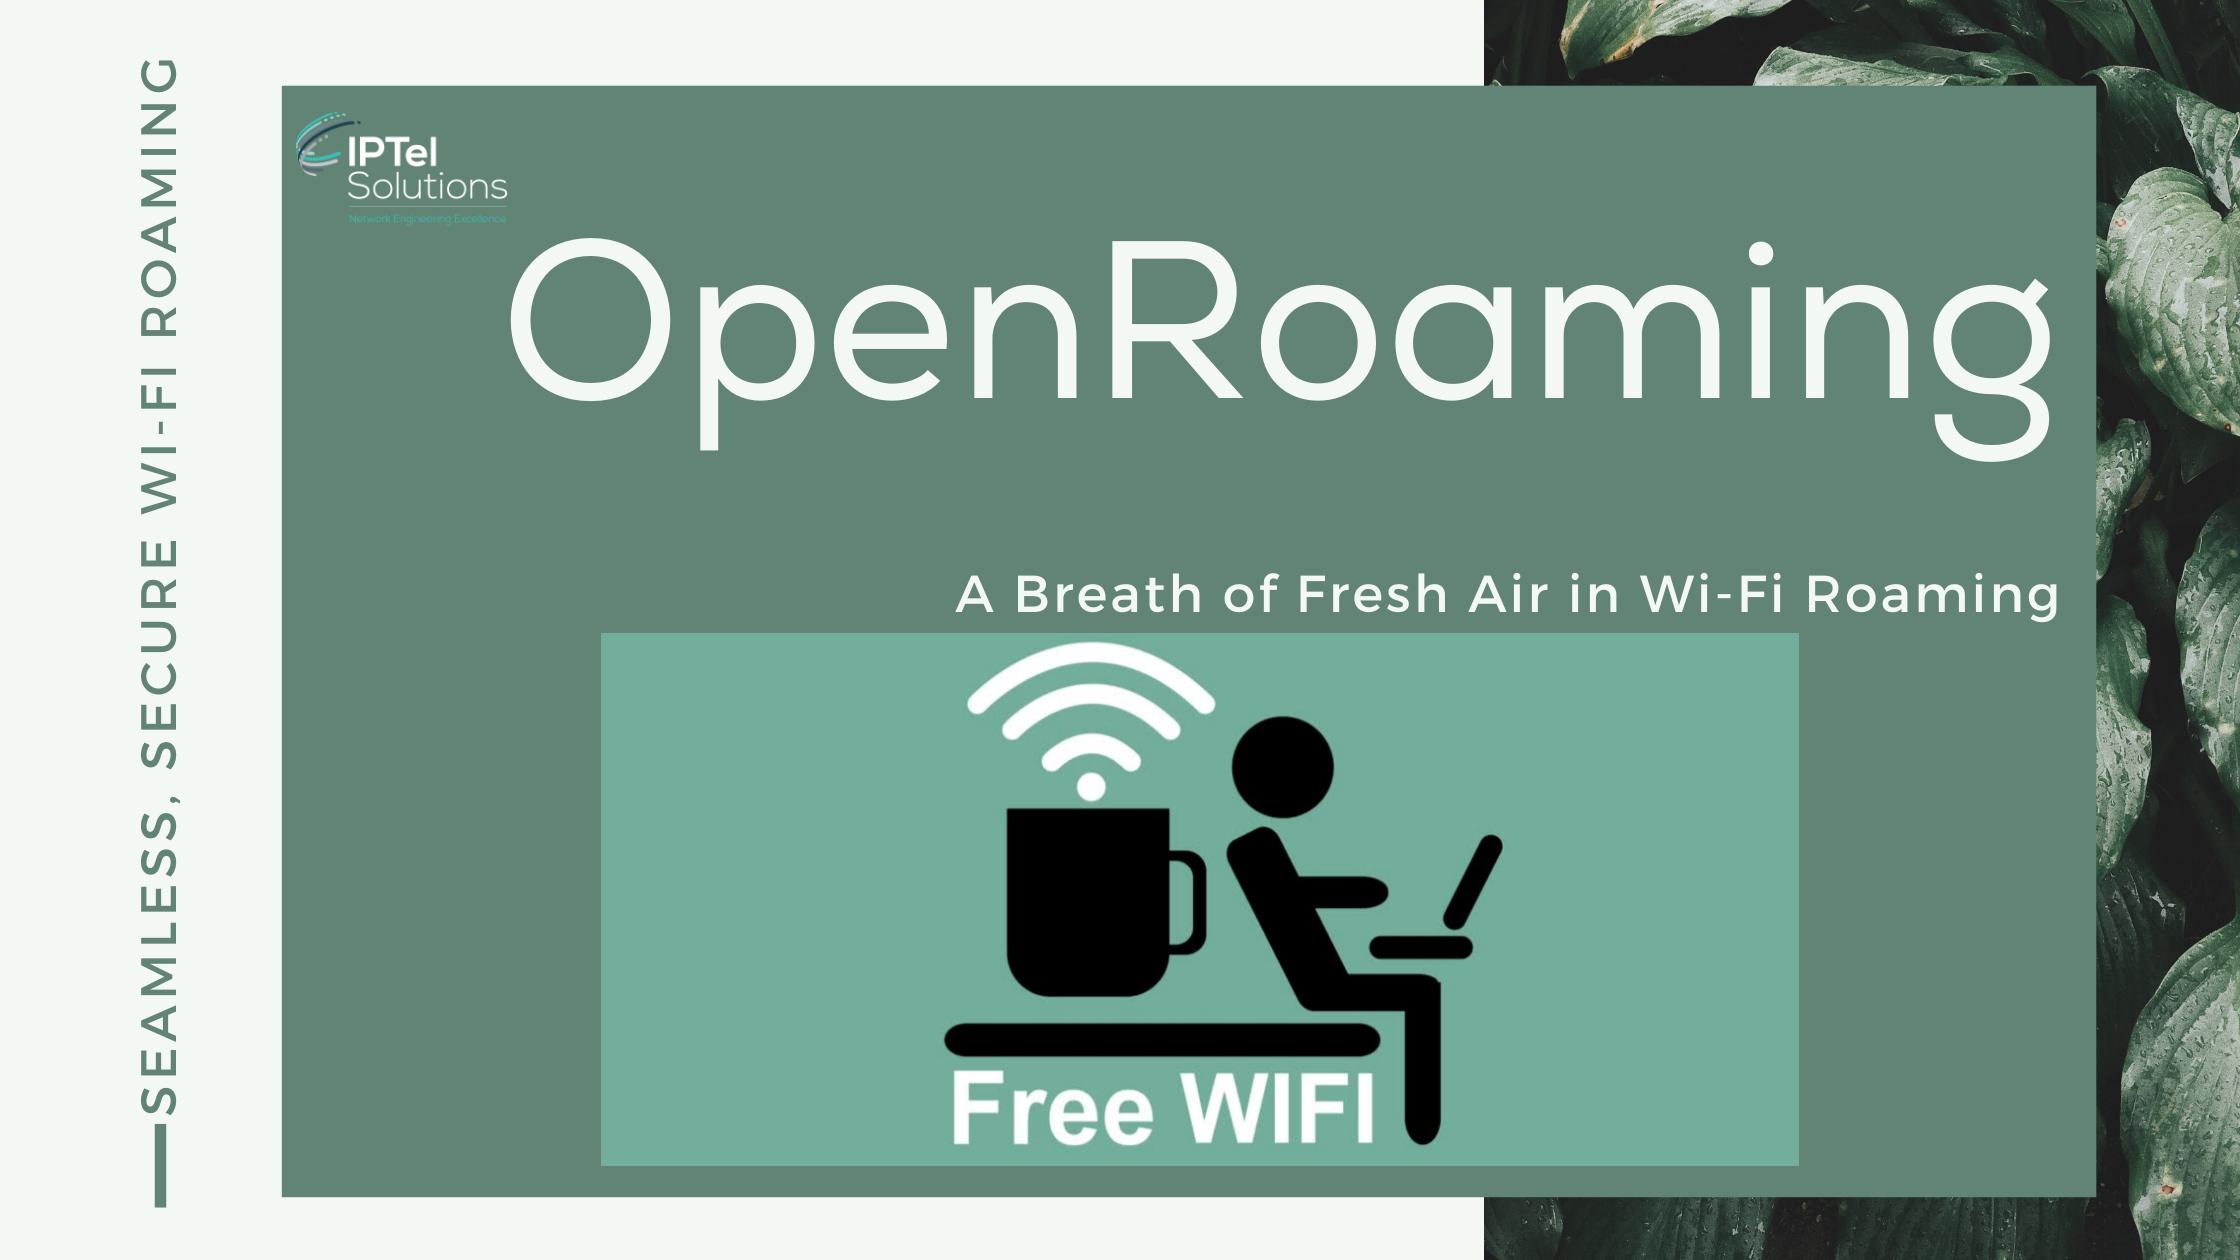 OpenRoaming